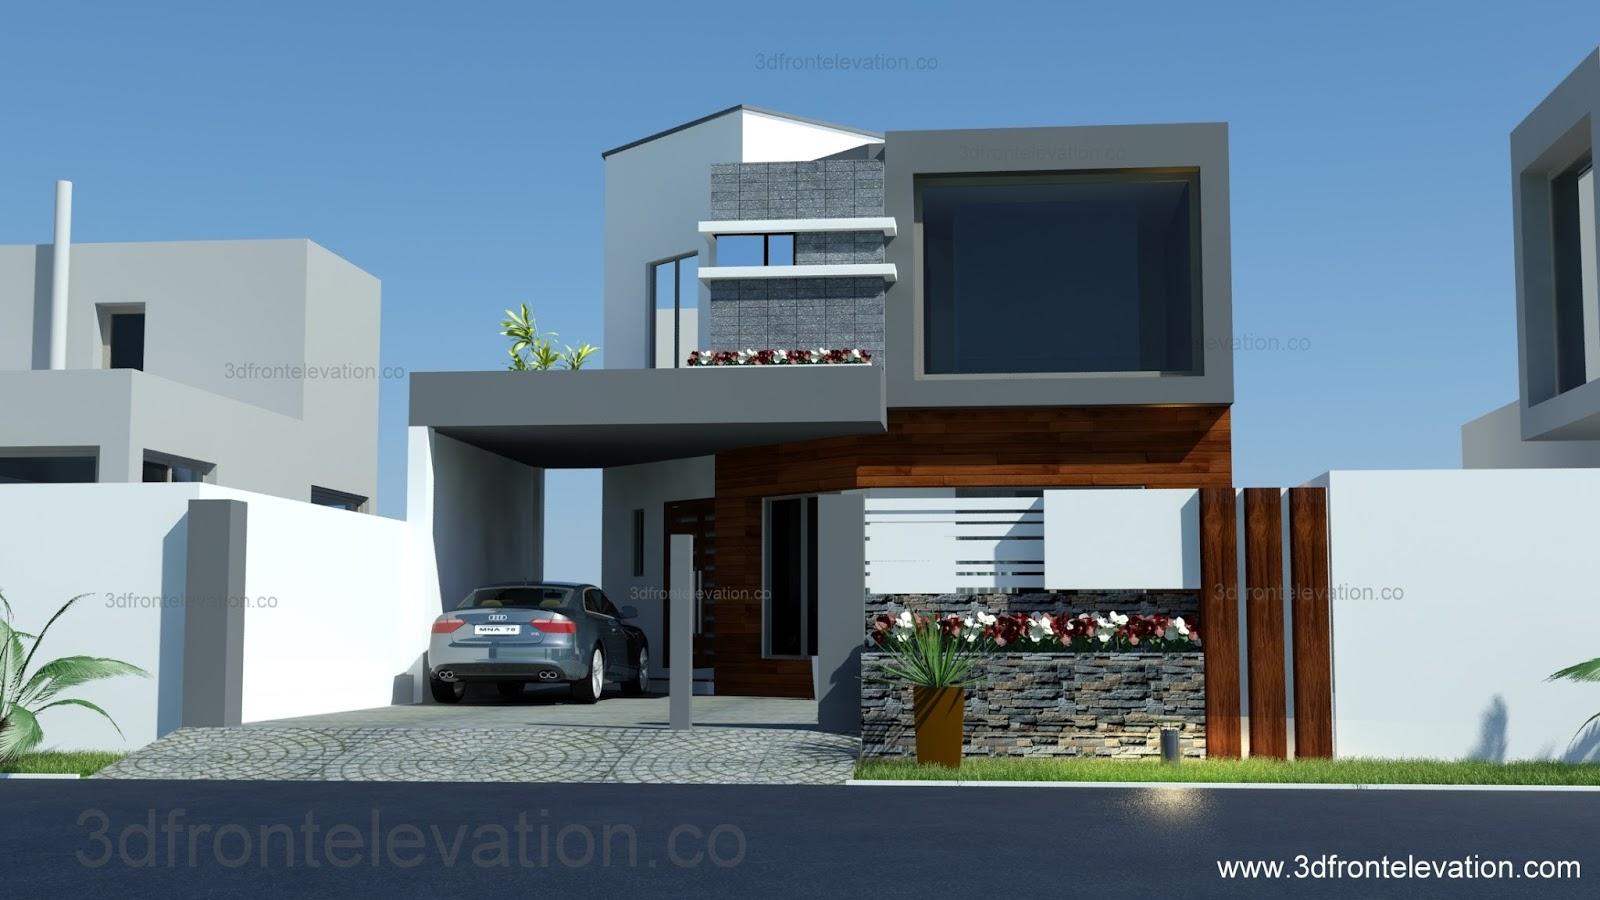 Home Front Elevation Design Marla : Marla house front elevation designs